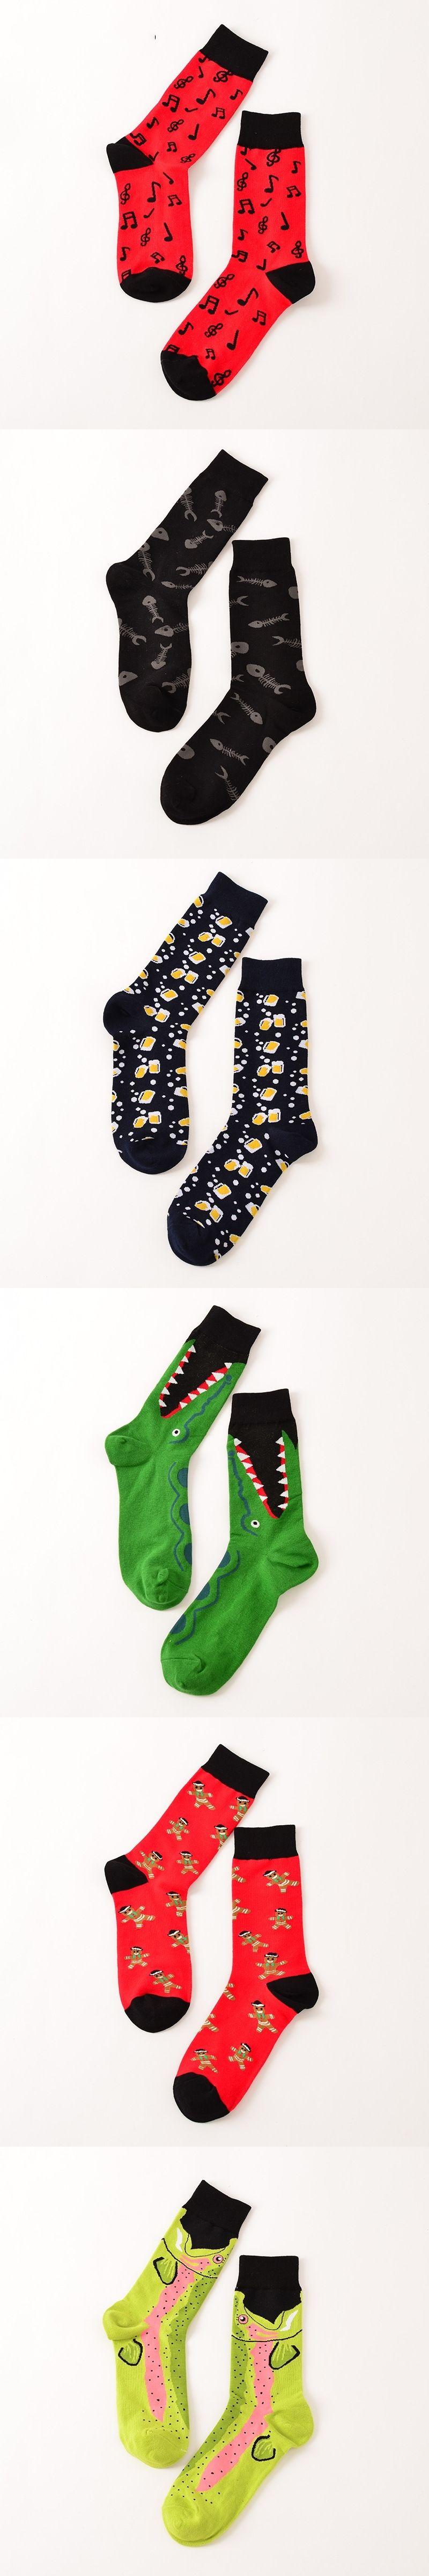 High Quality Socks Men Musical Note Beer Printed Cotton Hip Hop Long Happy  Funny Sox Harajuku 7f6b6c2be5f